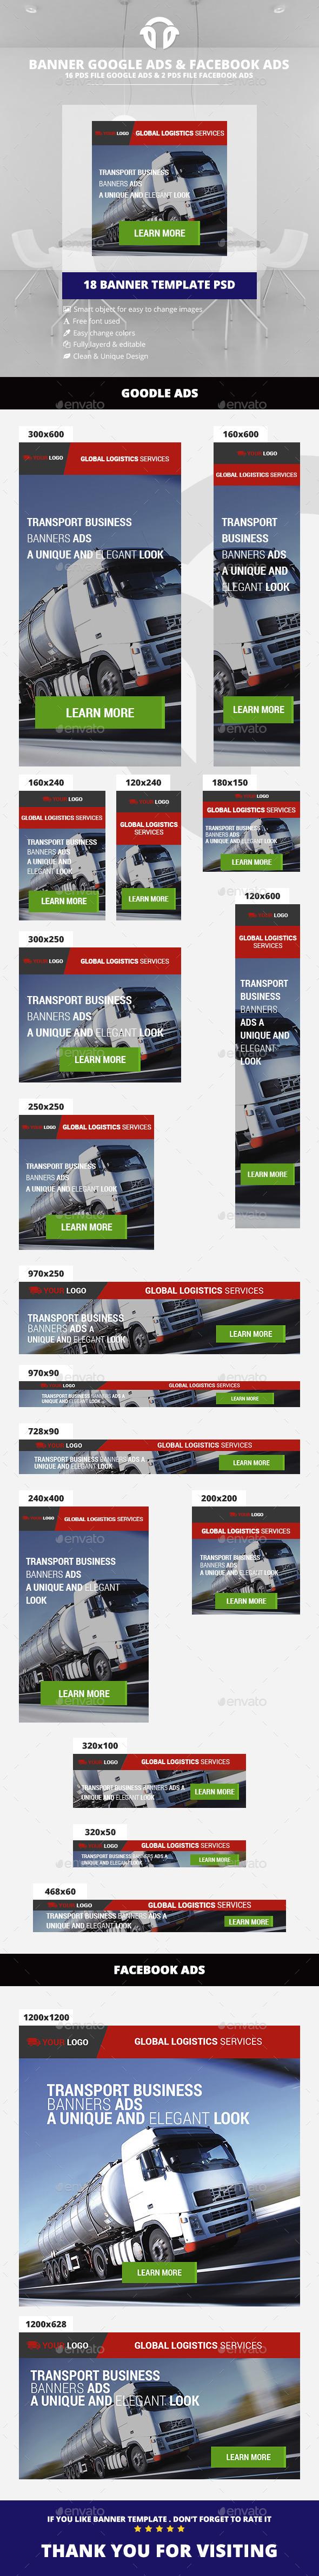 Logistics Service Banners - Banners & Ads Web Elements